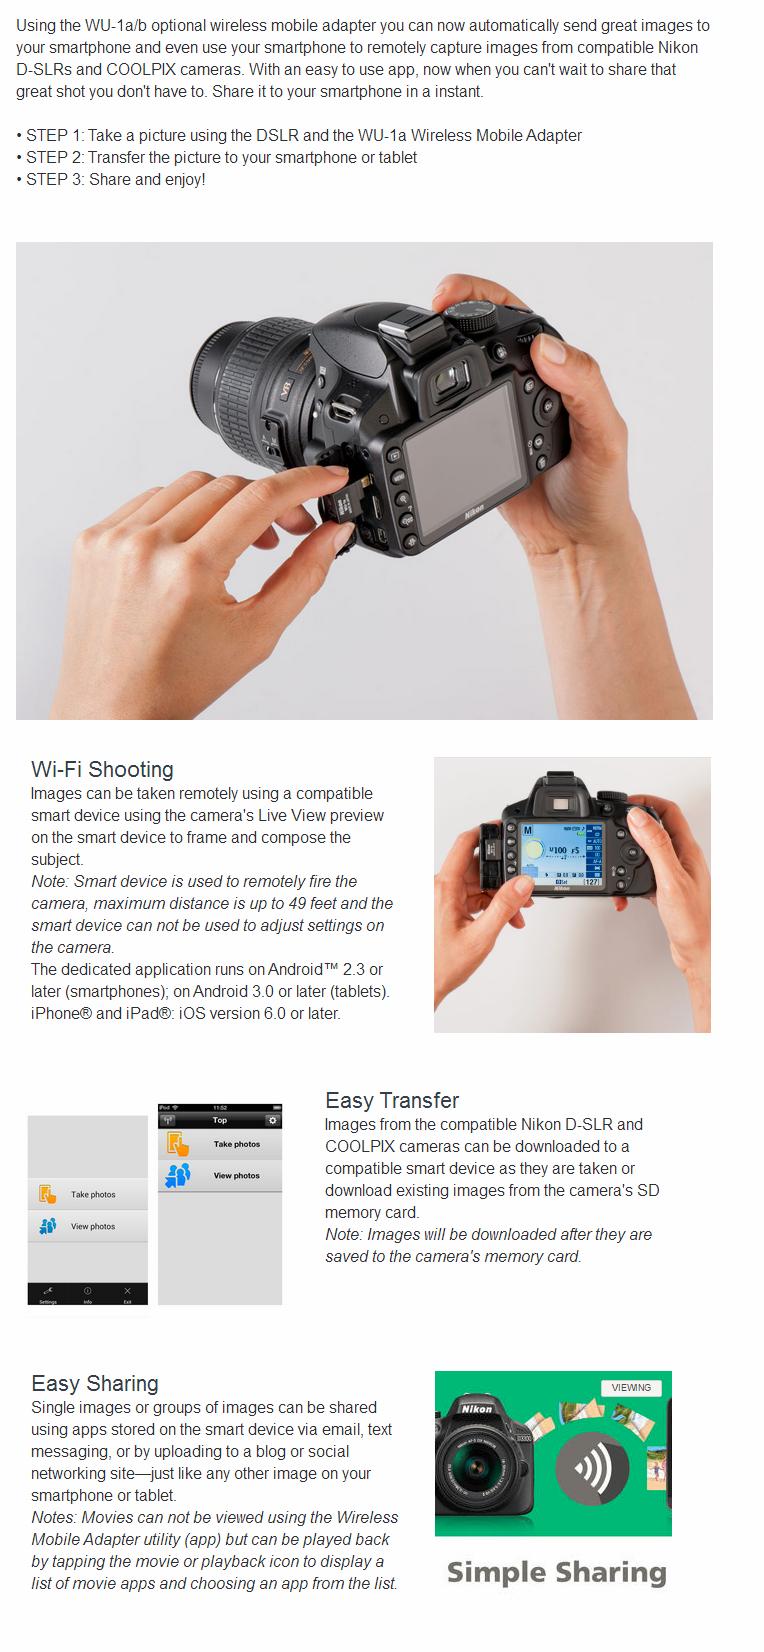 Nikon WU-1a Wireless Mobile Adapter 27081